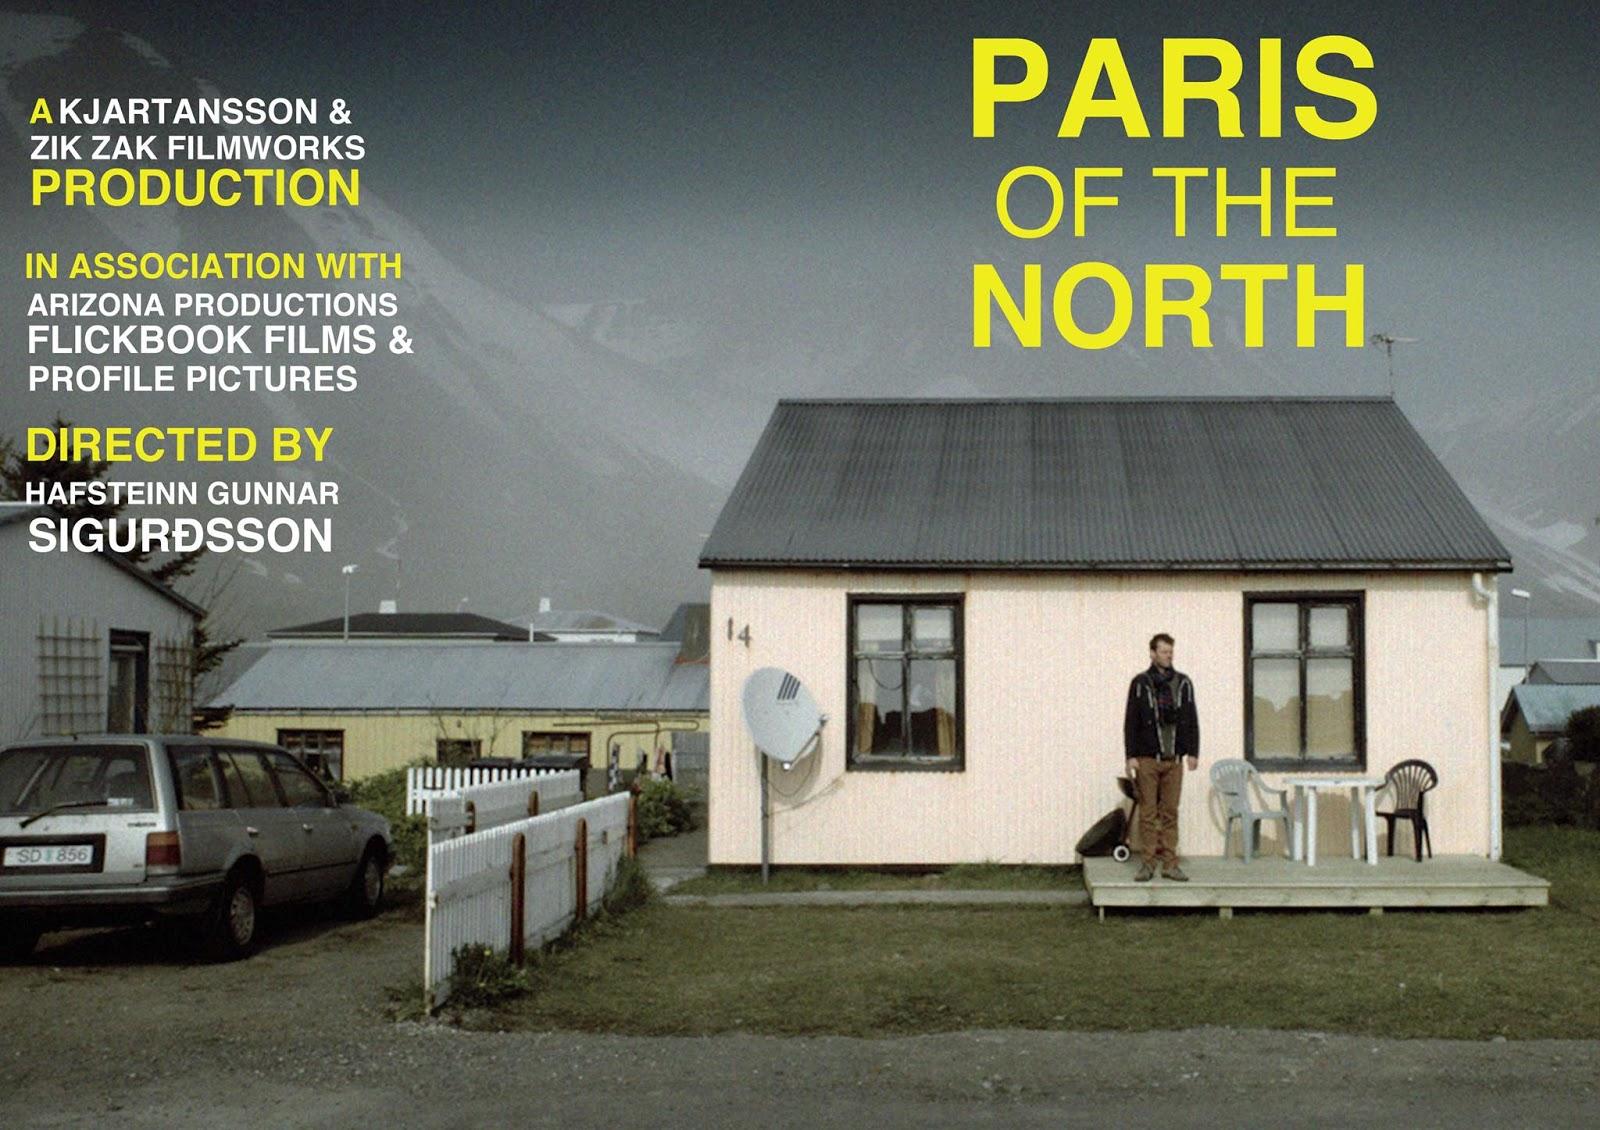 Paris of the North (París norðursins)